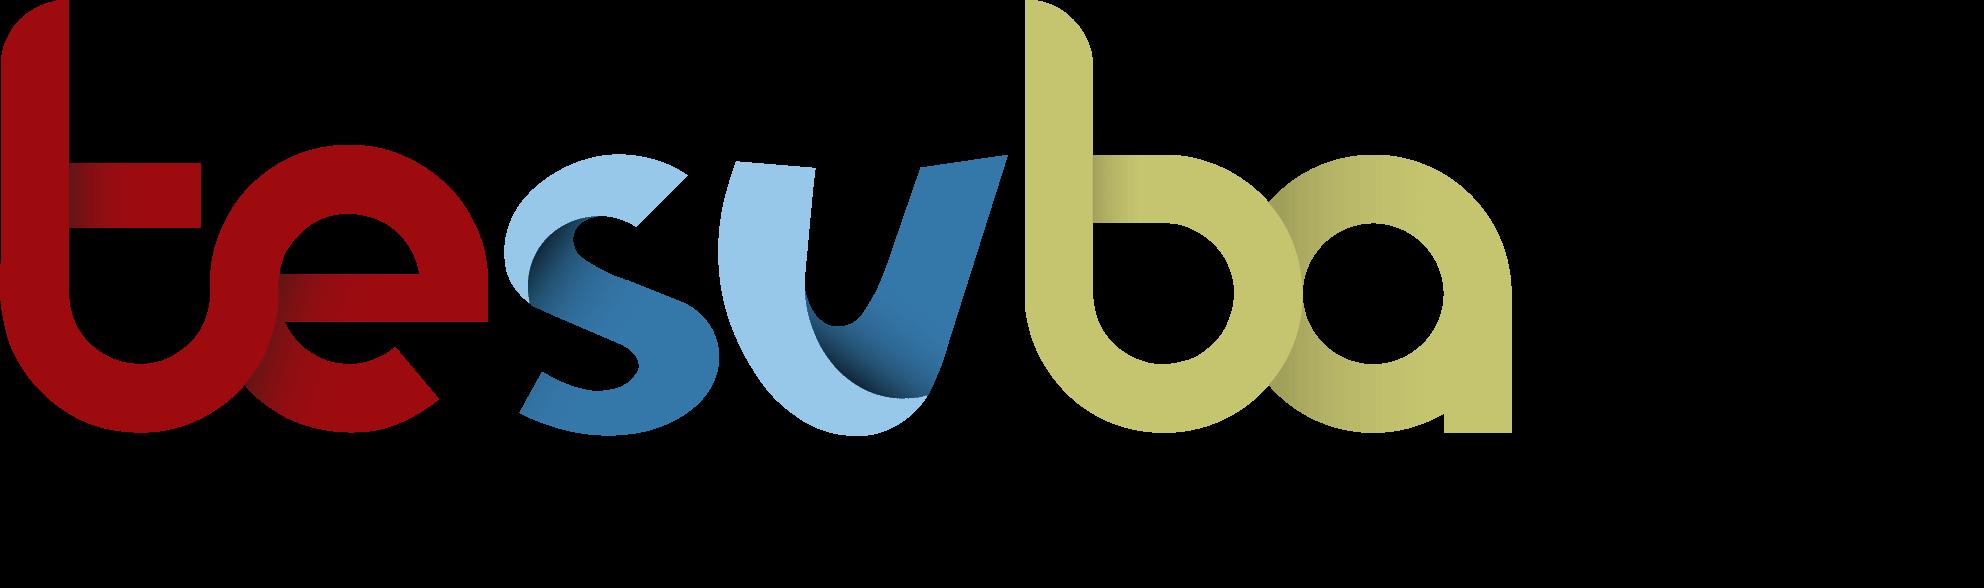 Tesuba